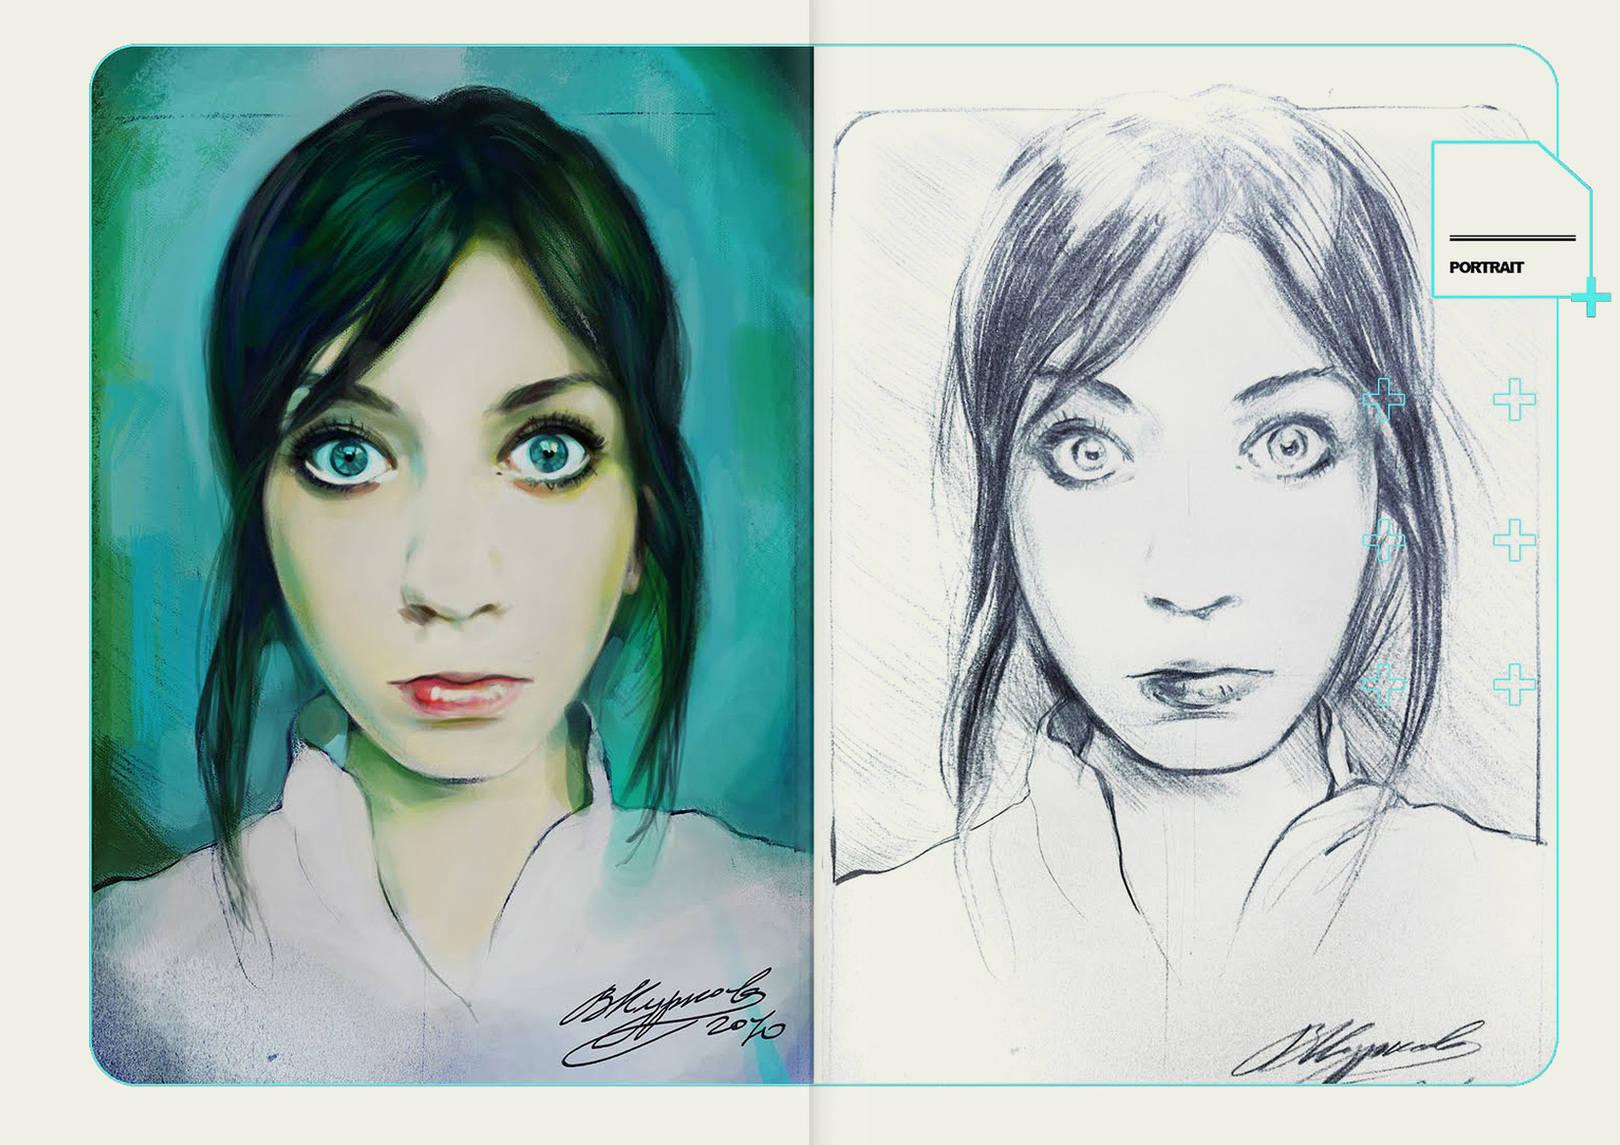 Portraite